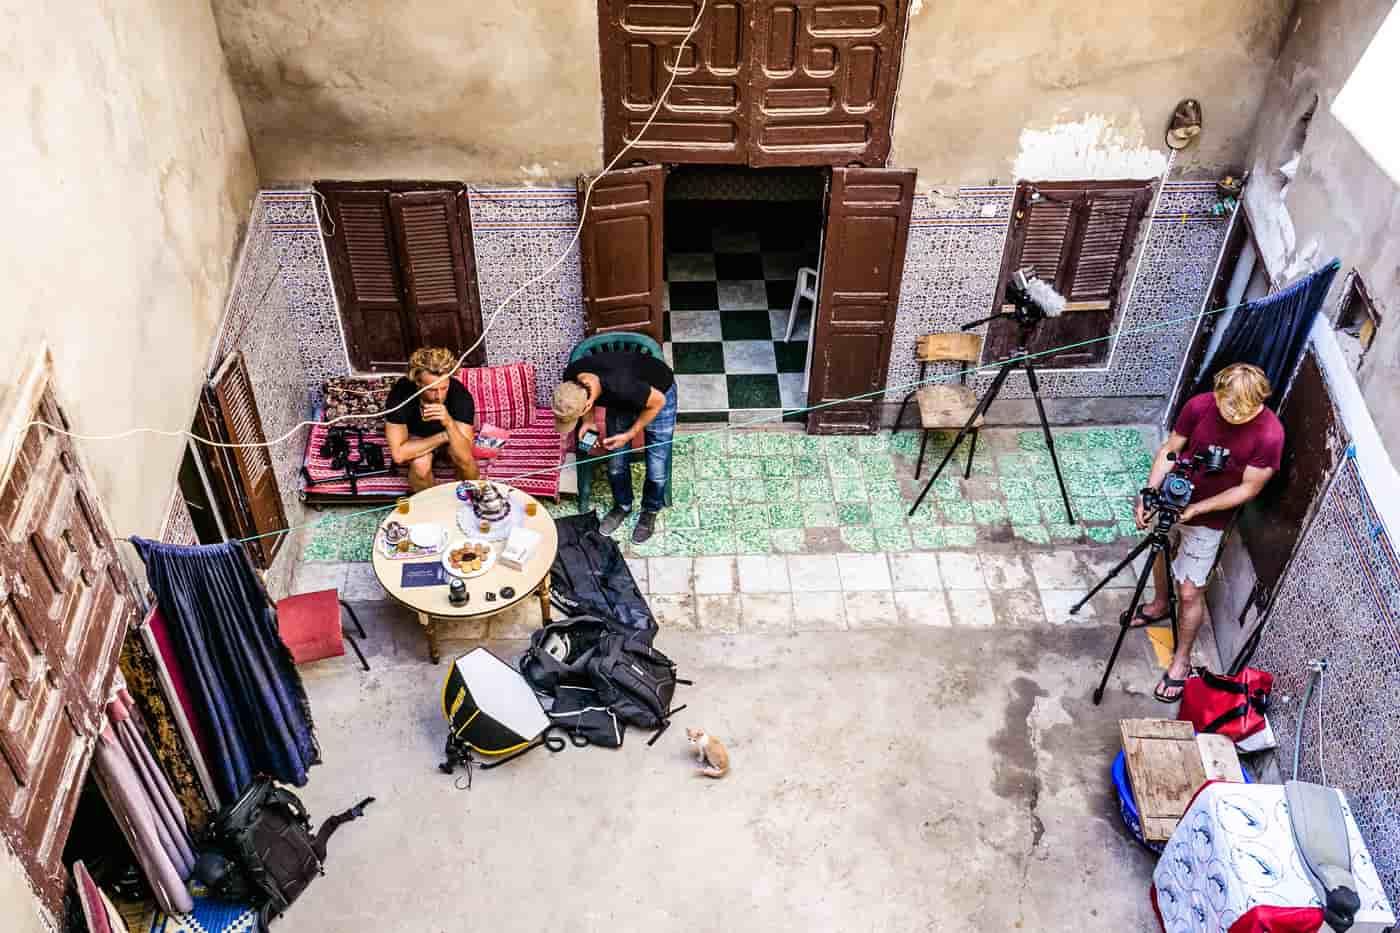 FREITAG and Beyond - Funky old Medina